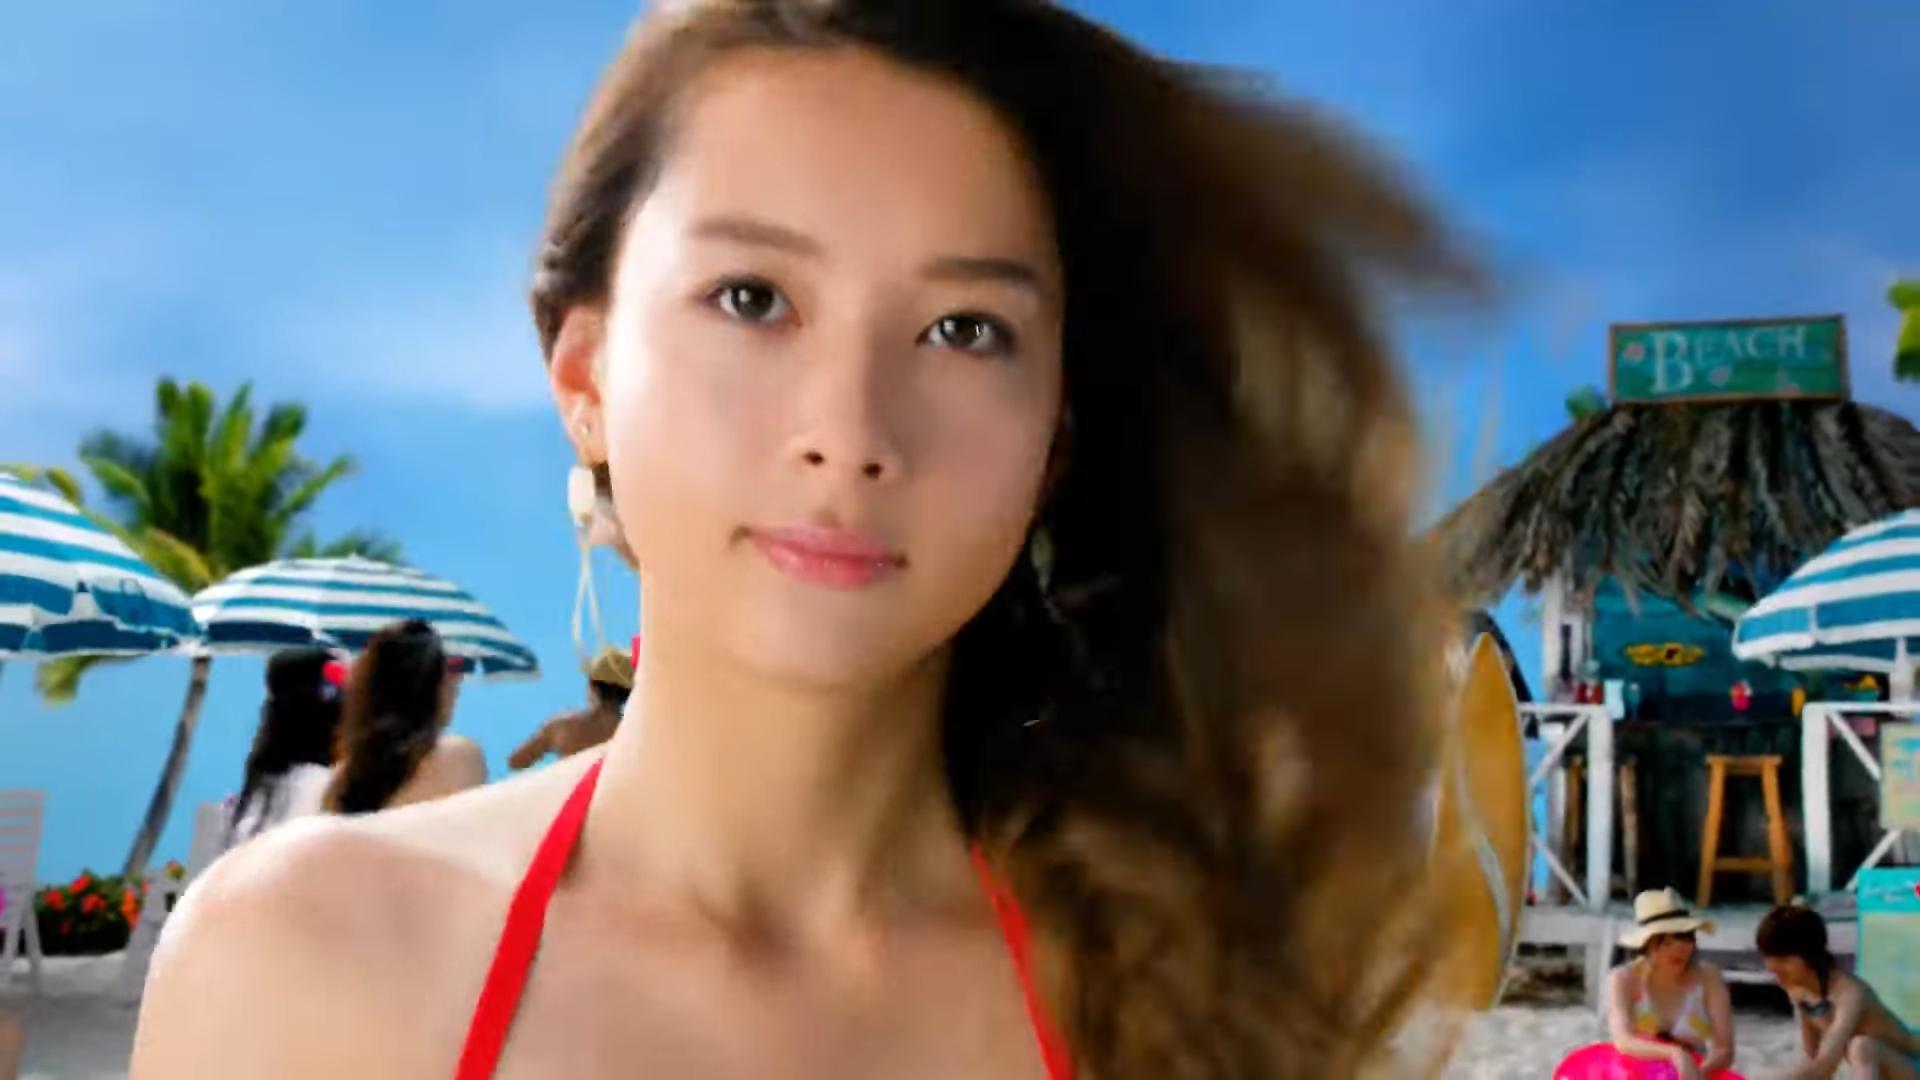 Niki(丹羽仁希)のヌード・水着グラビア等抜けるエロ画像110枚・44枚目の画像